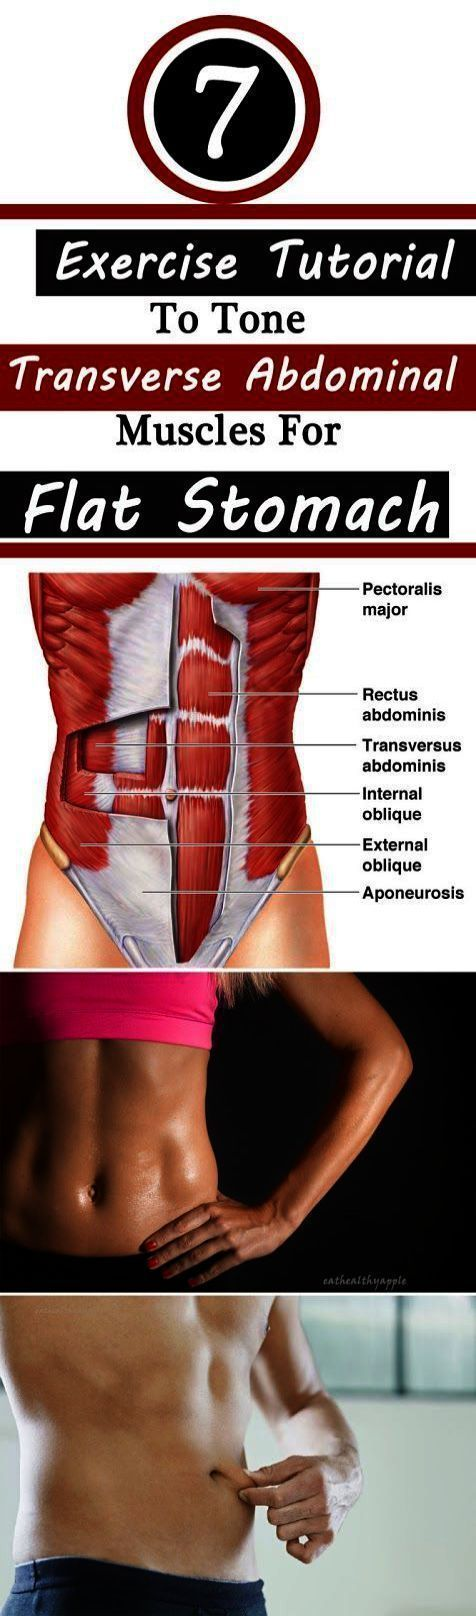 # Bauch #ABS # Gürtel #EMS # Geräte Fitness Beine # Kö -  #abdominal #SEKTION #Gürtel #EMS #Ausrüstu...